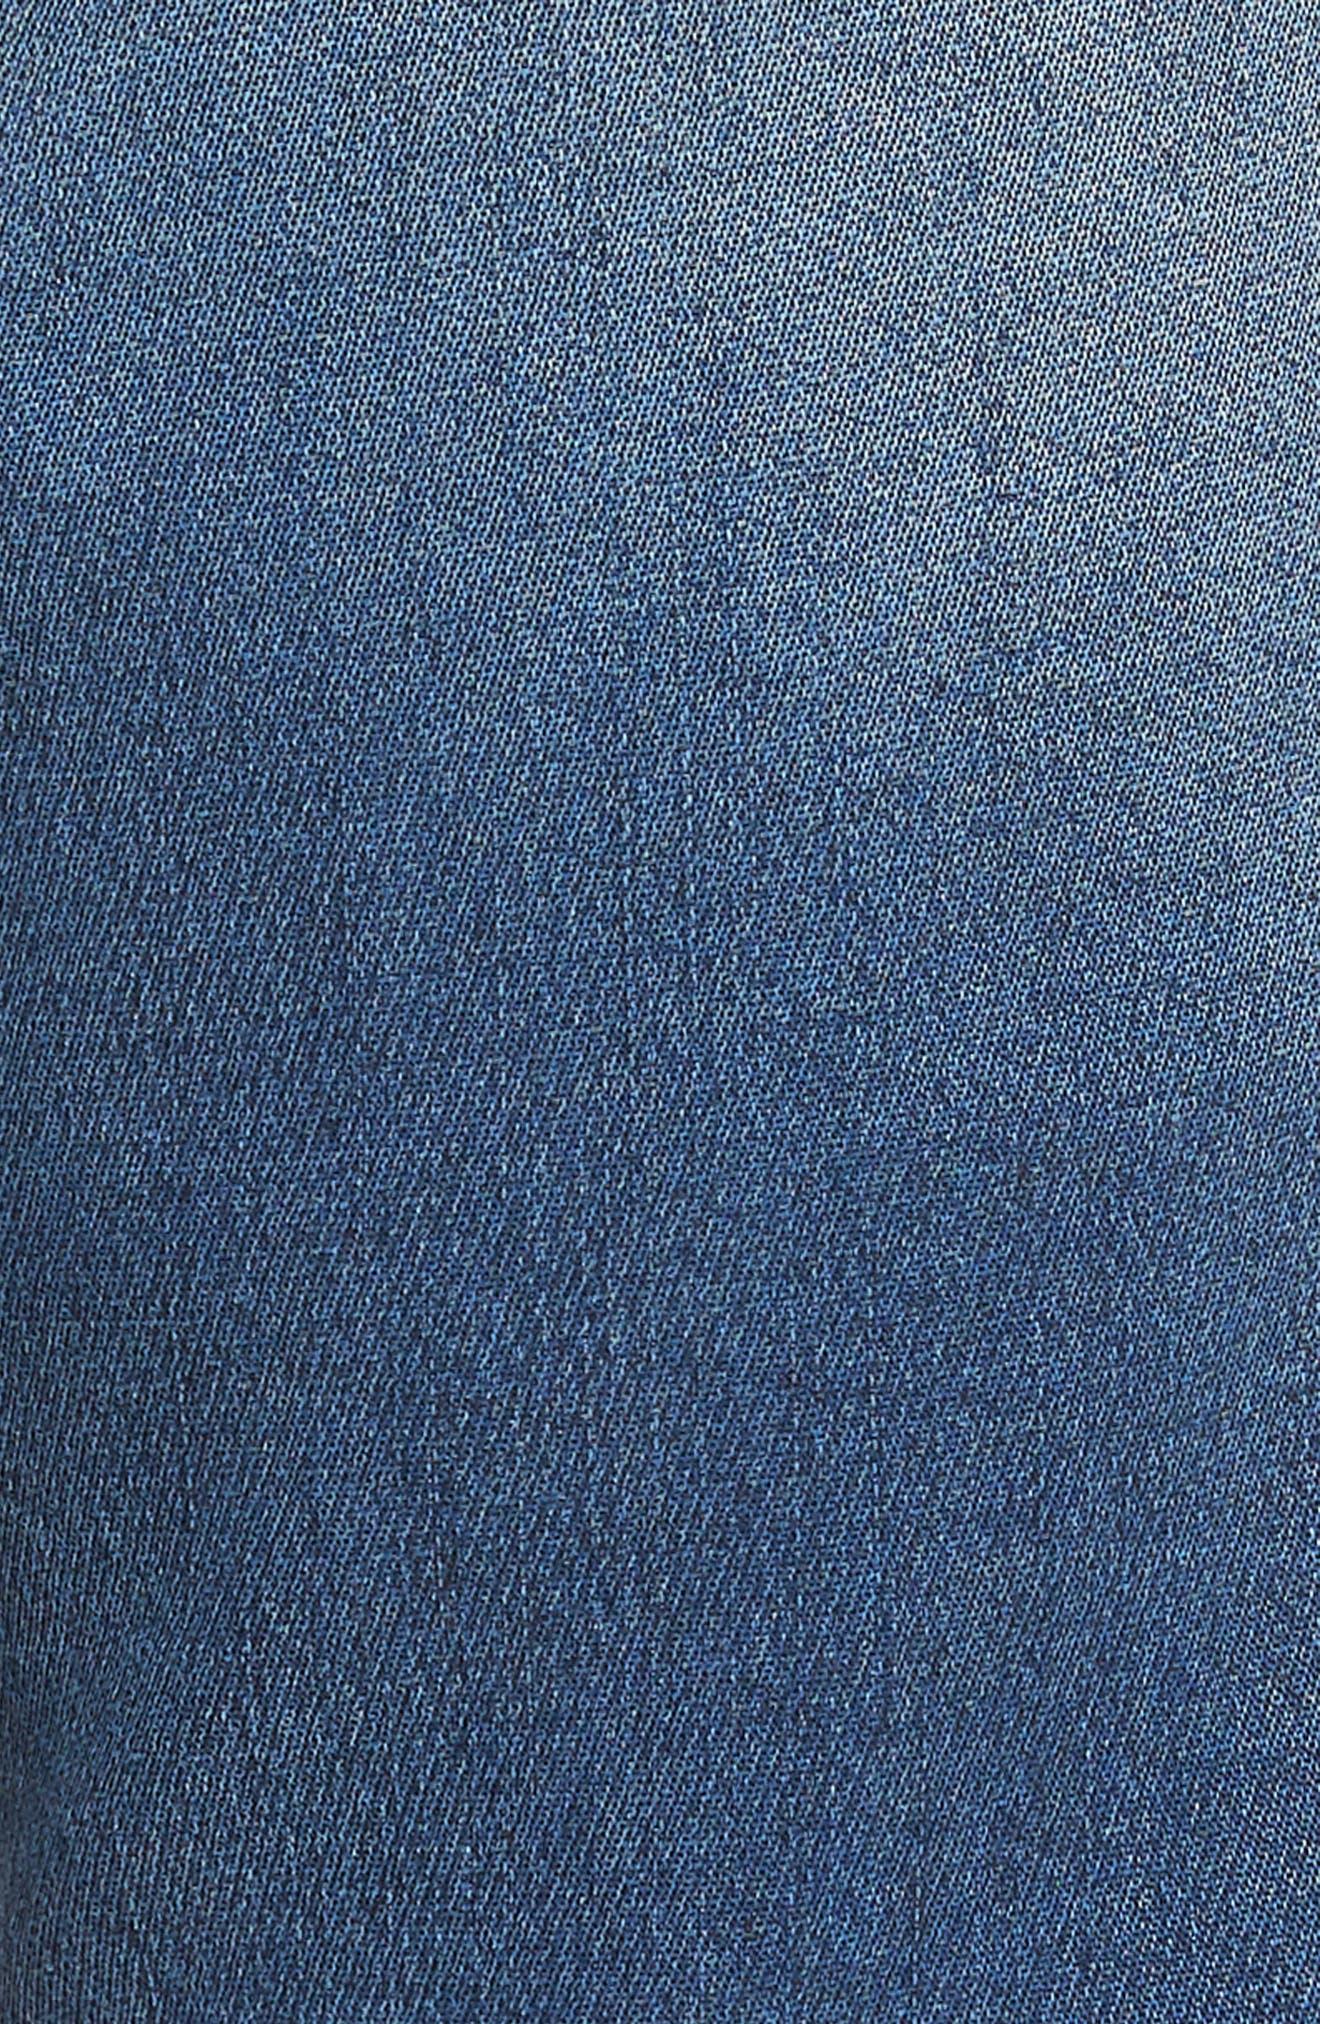 Bakari Skinny Fit Jeans,                             Alternate thumbnail 5, color,                             400